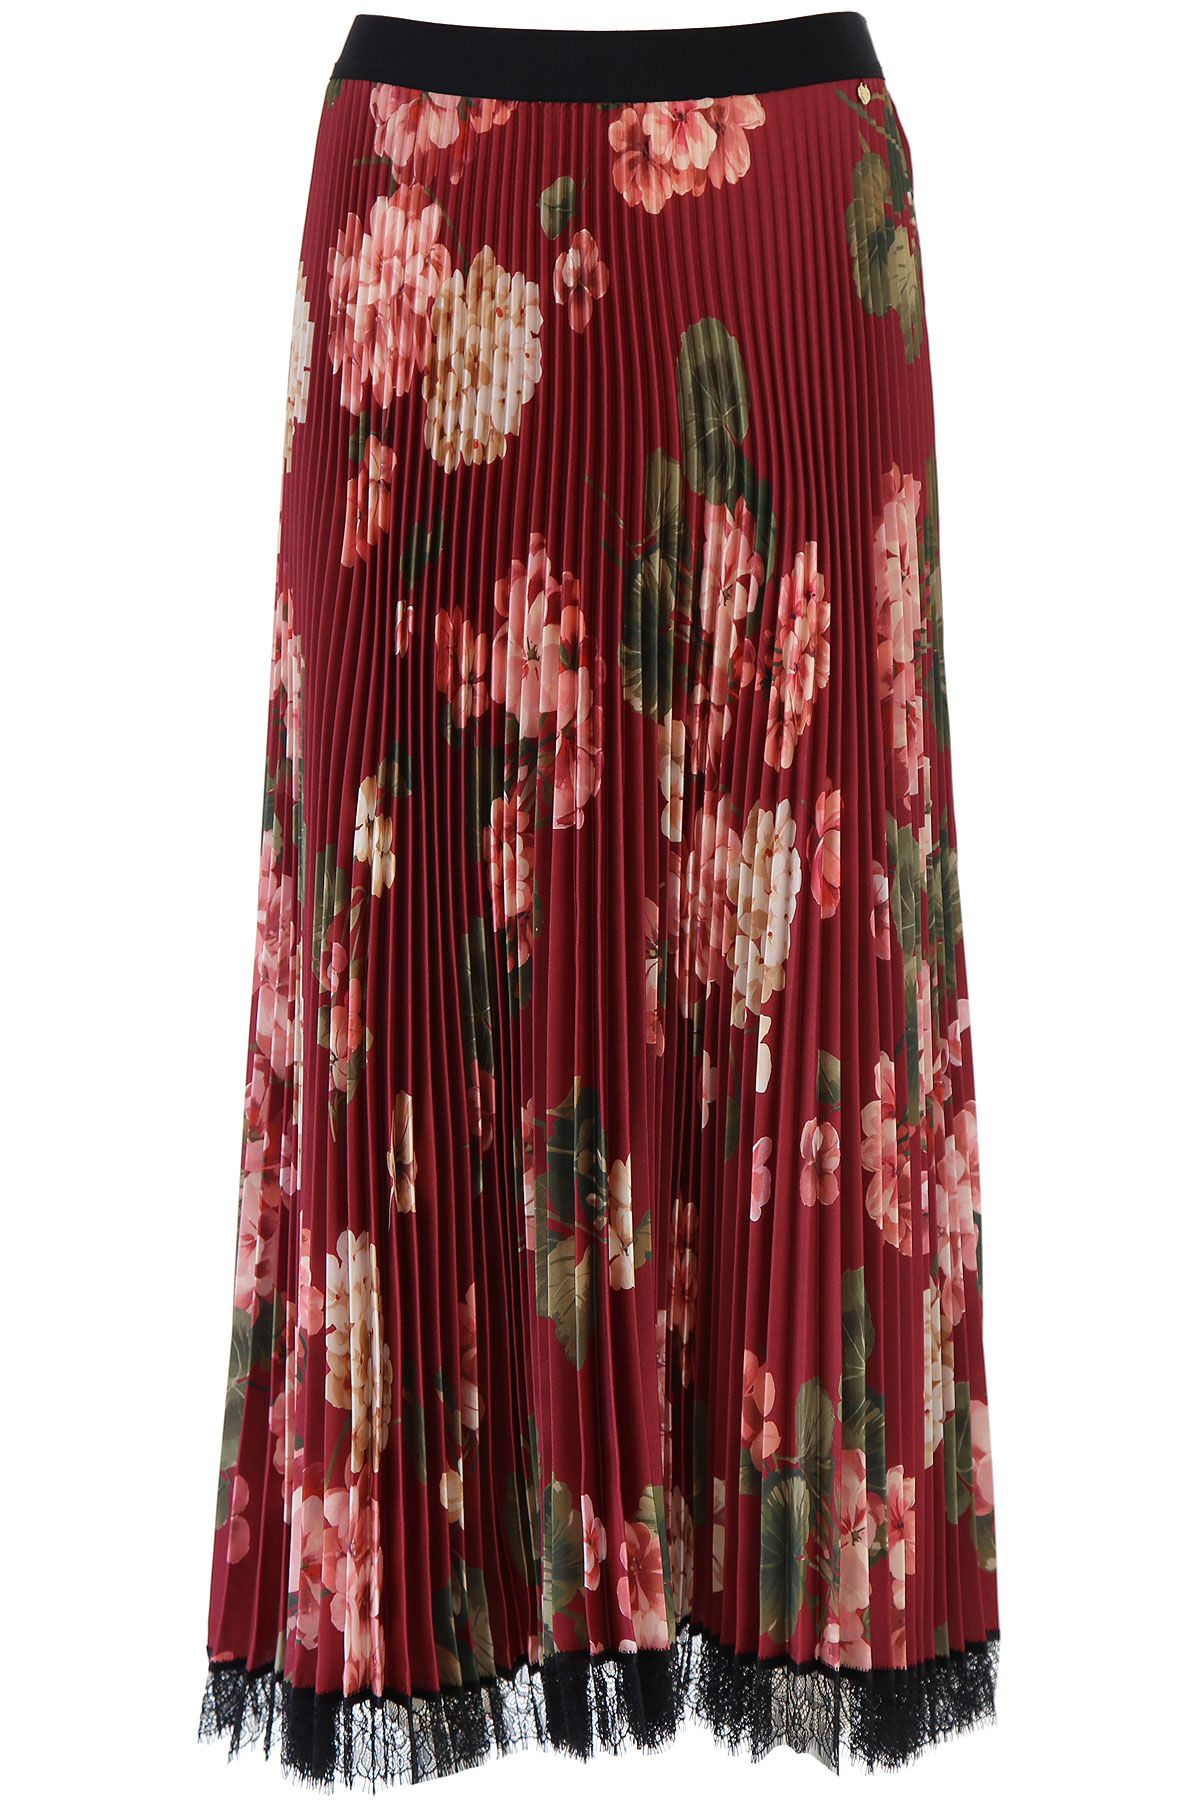 premium selection ec222 1b51a Womens Clothing Twin Set by Simona Barbieri, Style code ...